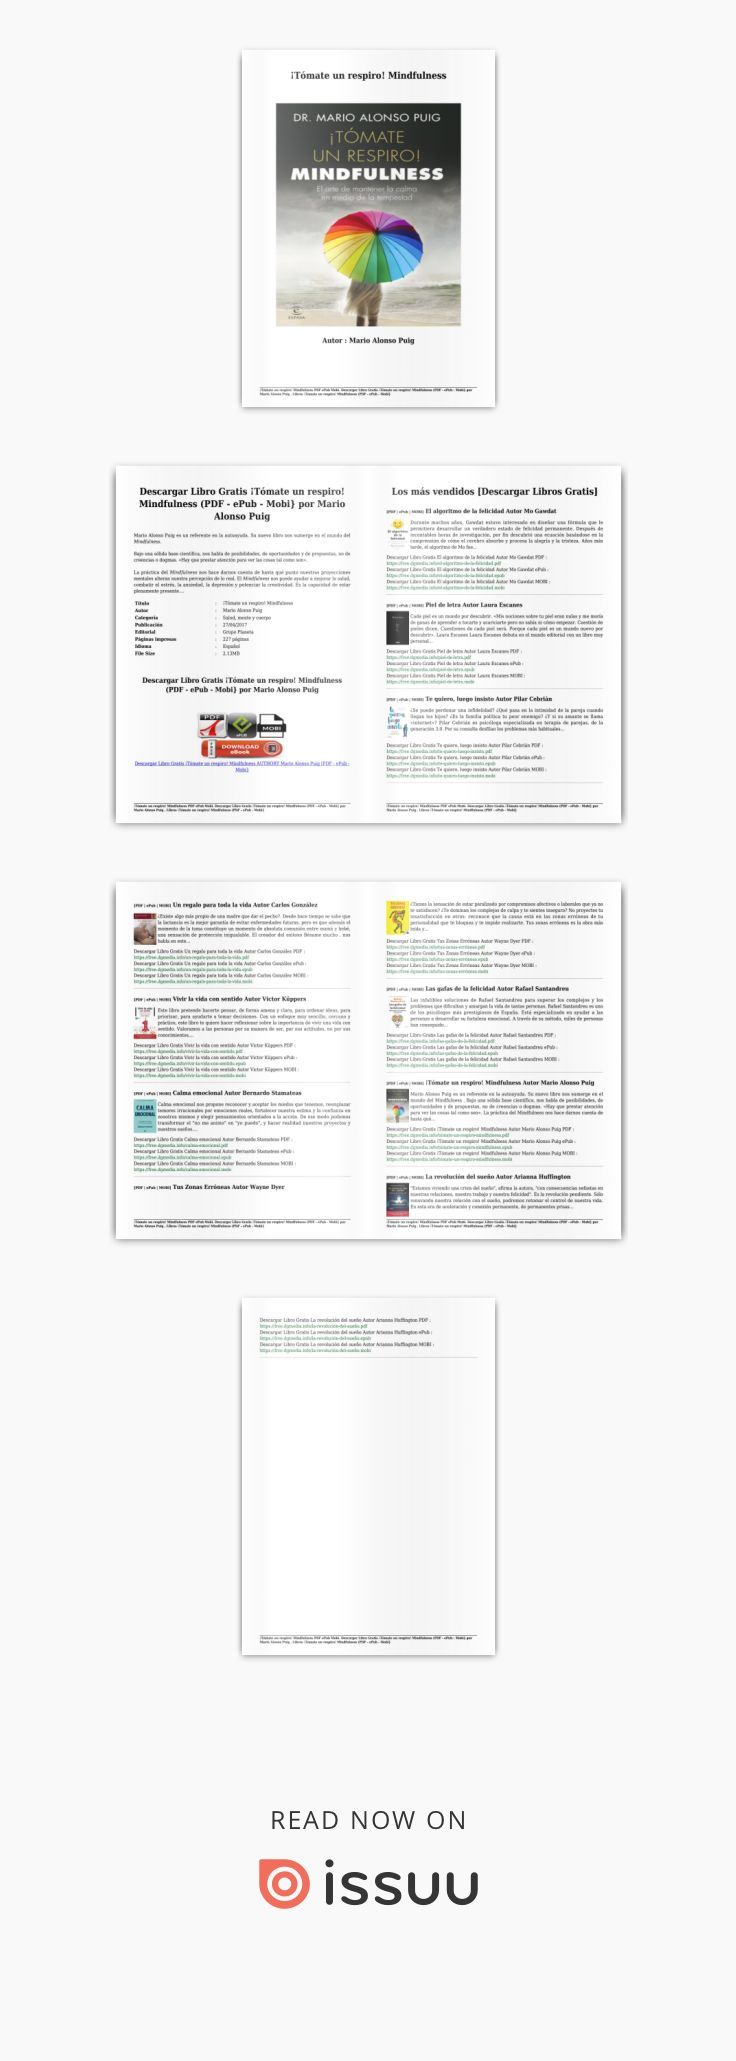 tómate un respiro mindfulness pdf descargar gratis